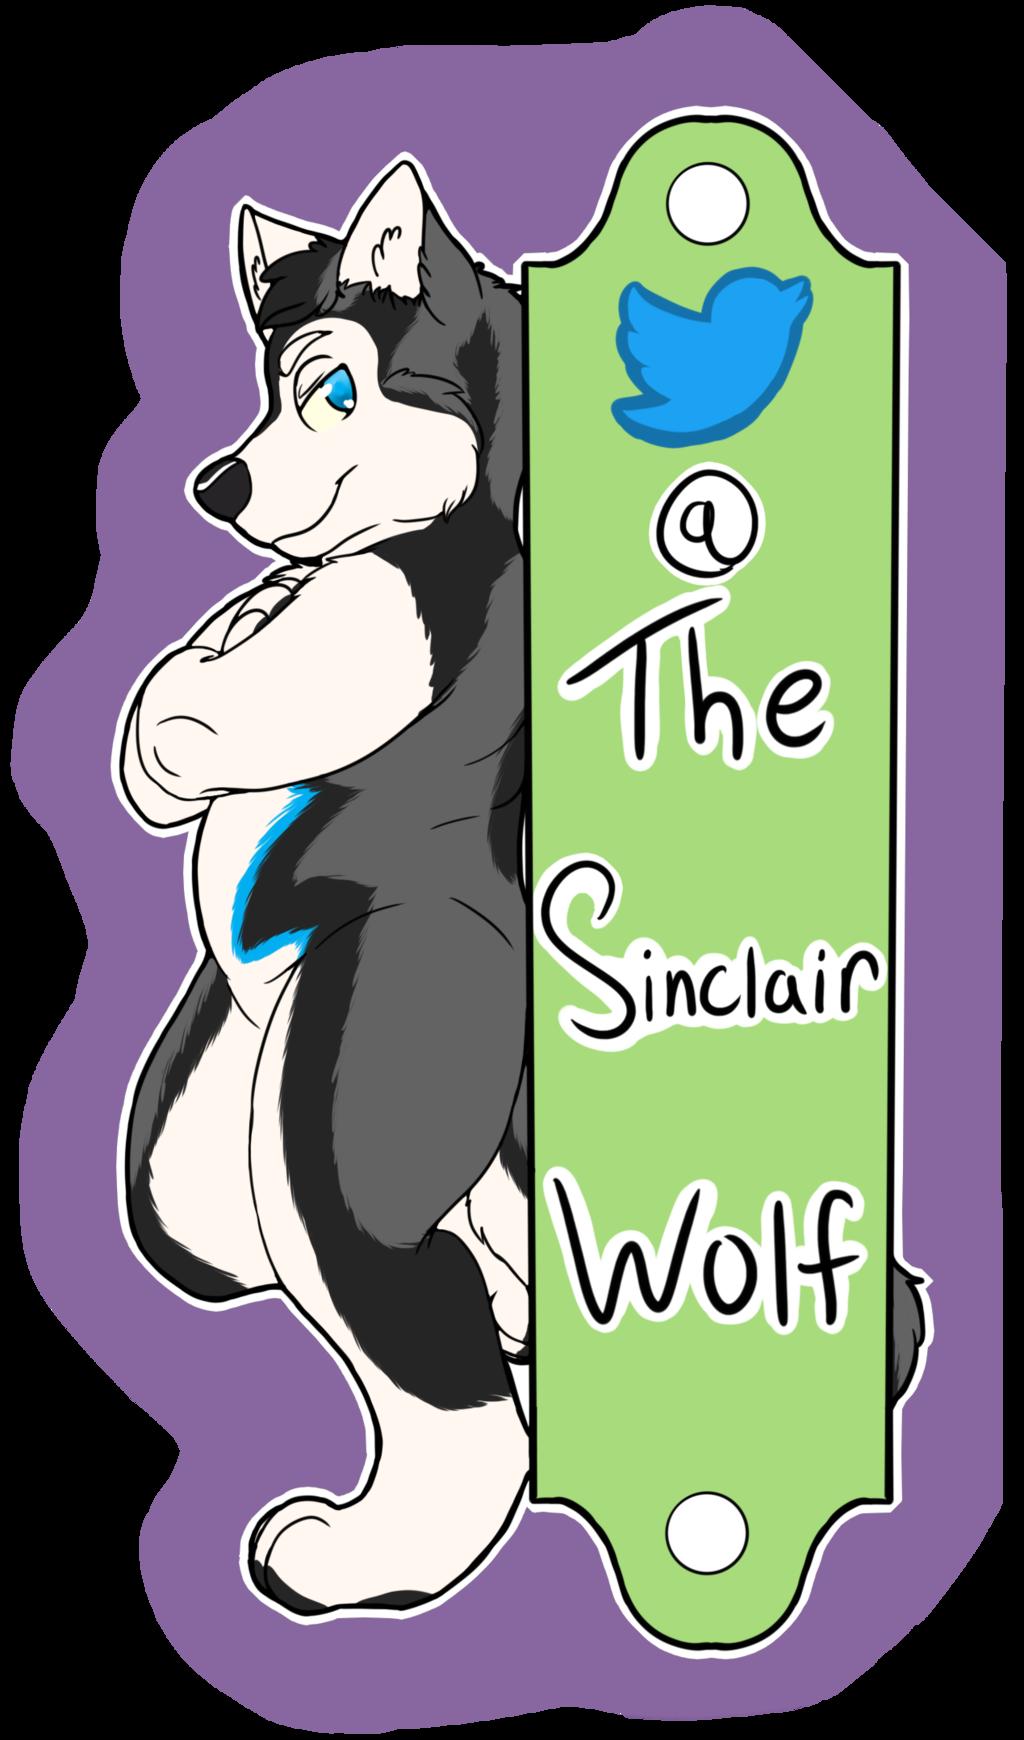 [C] Sinclair fullbody sticker!